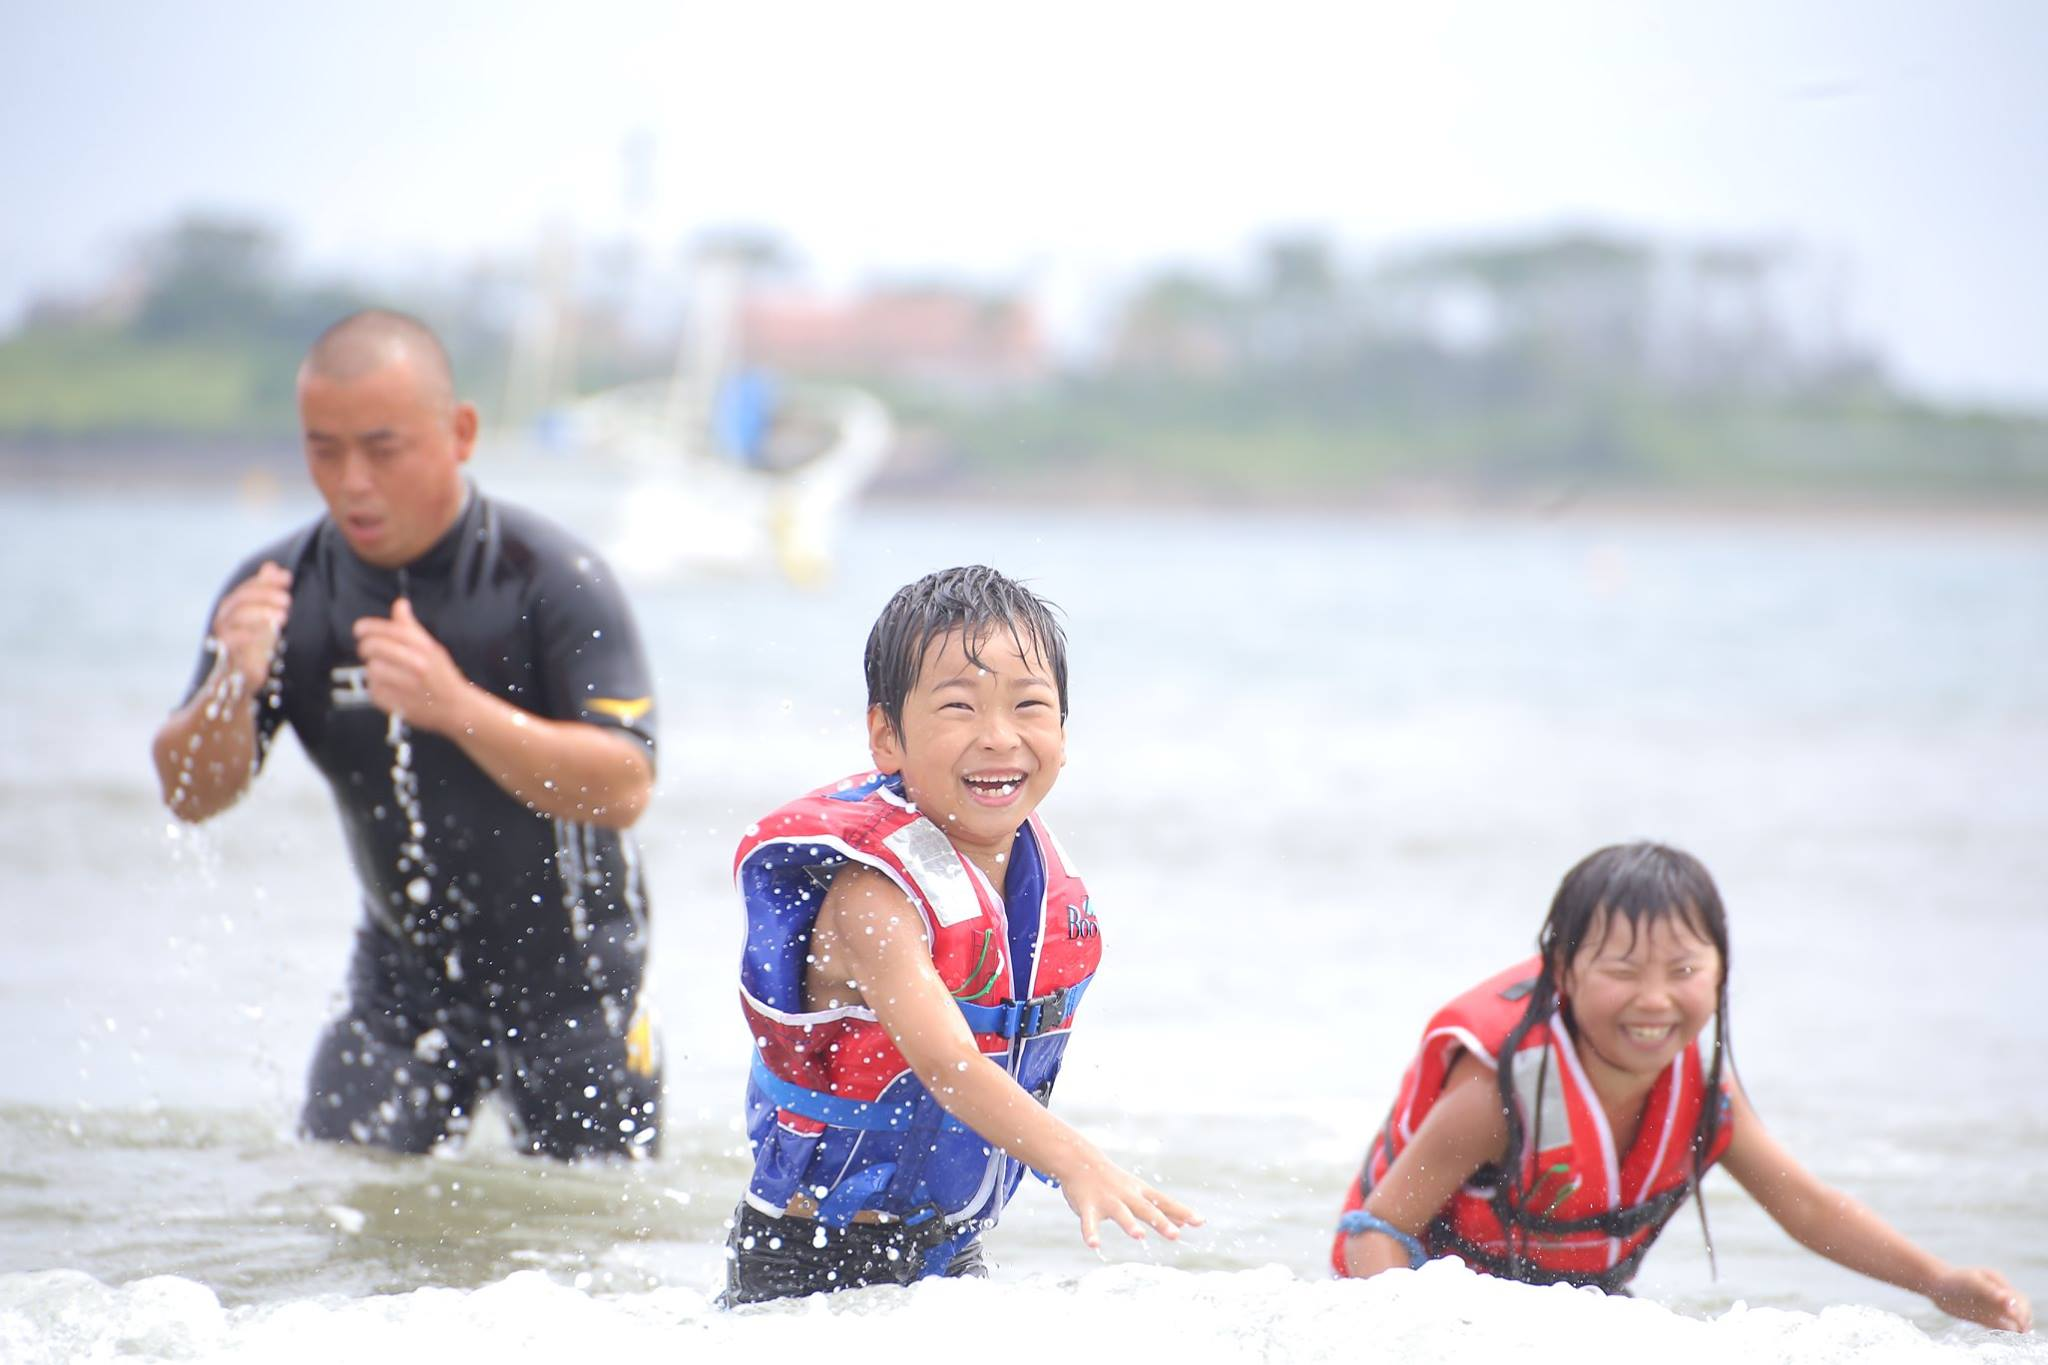 Hamawarasu: Learning to be a kid again